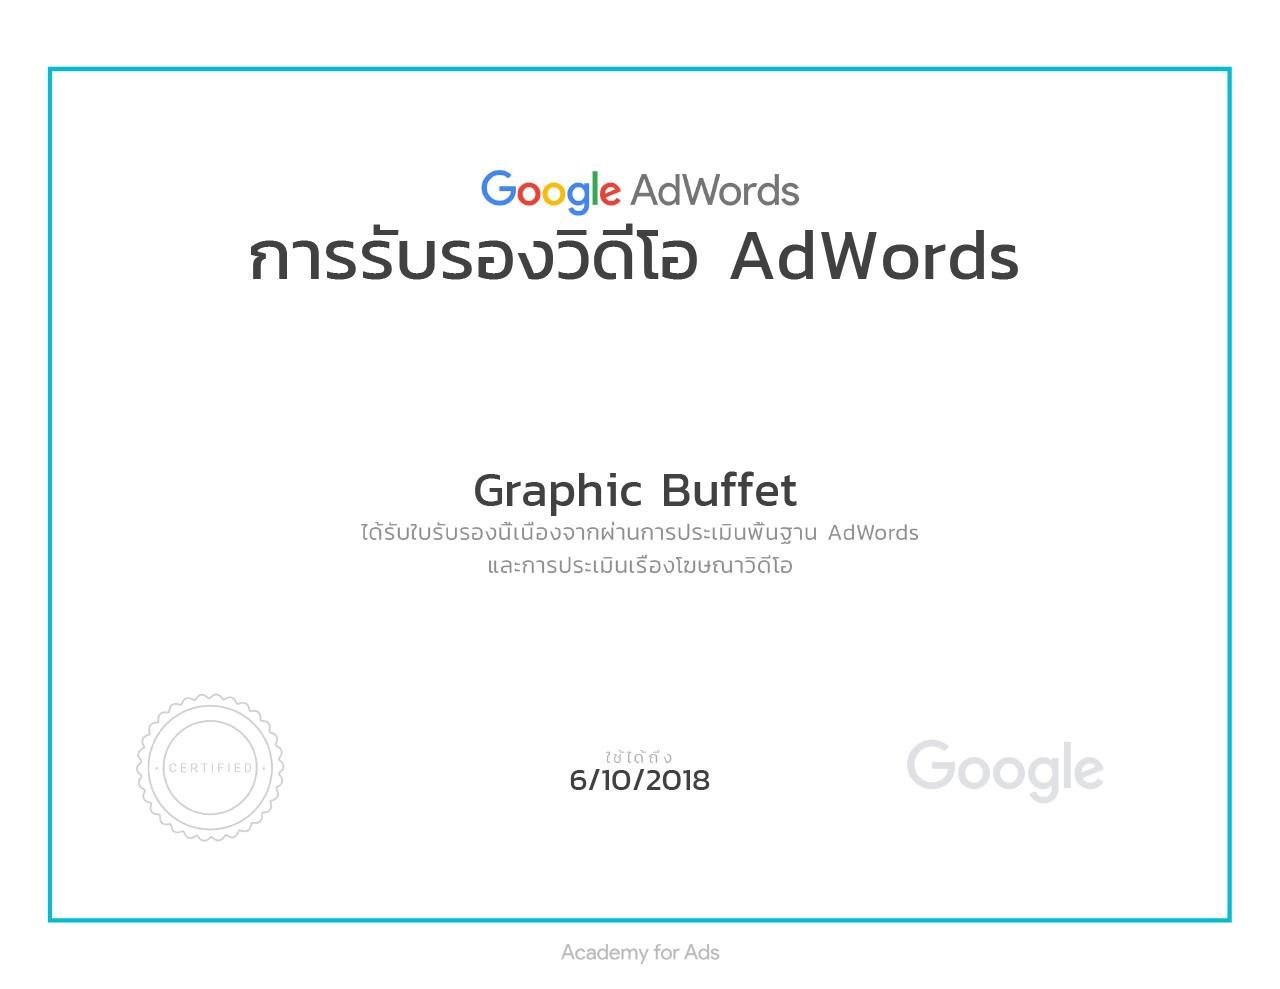 certificate 03640 6832681 รับทำ Google Adwords